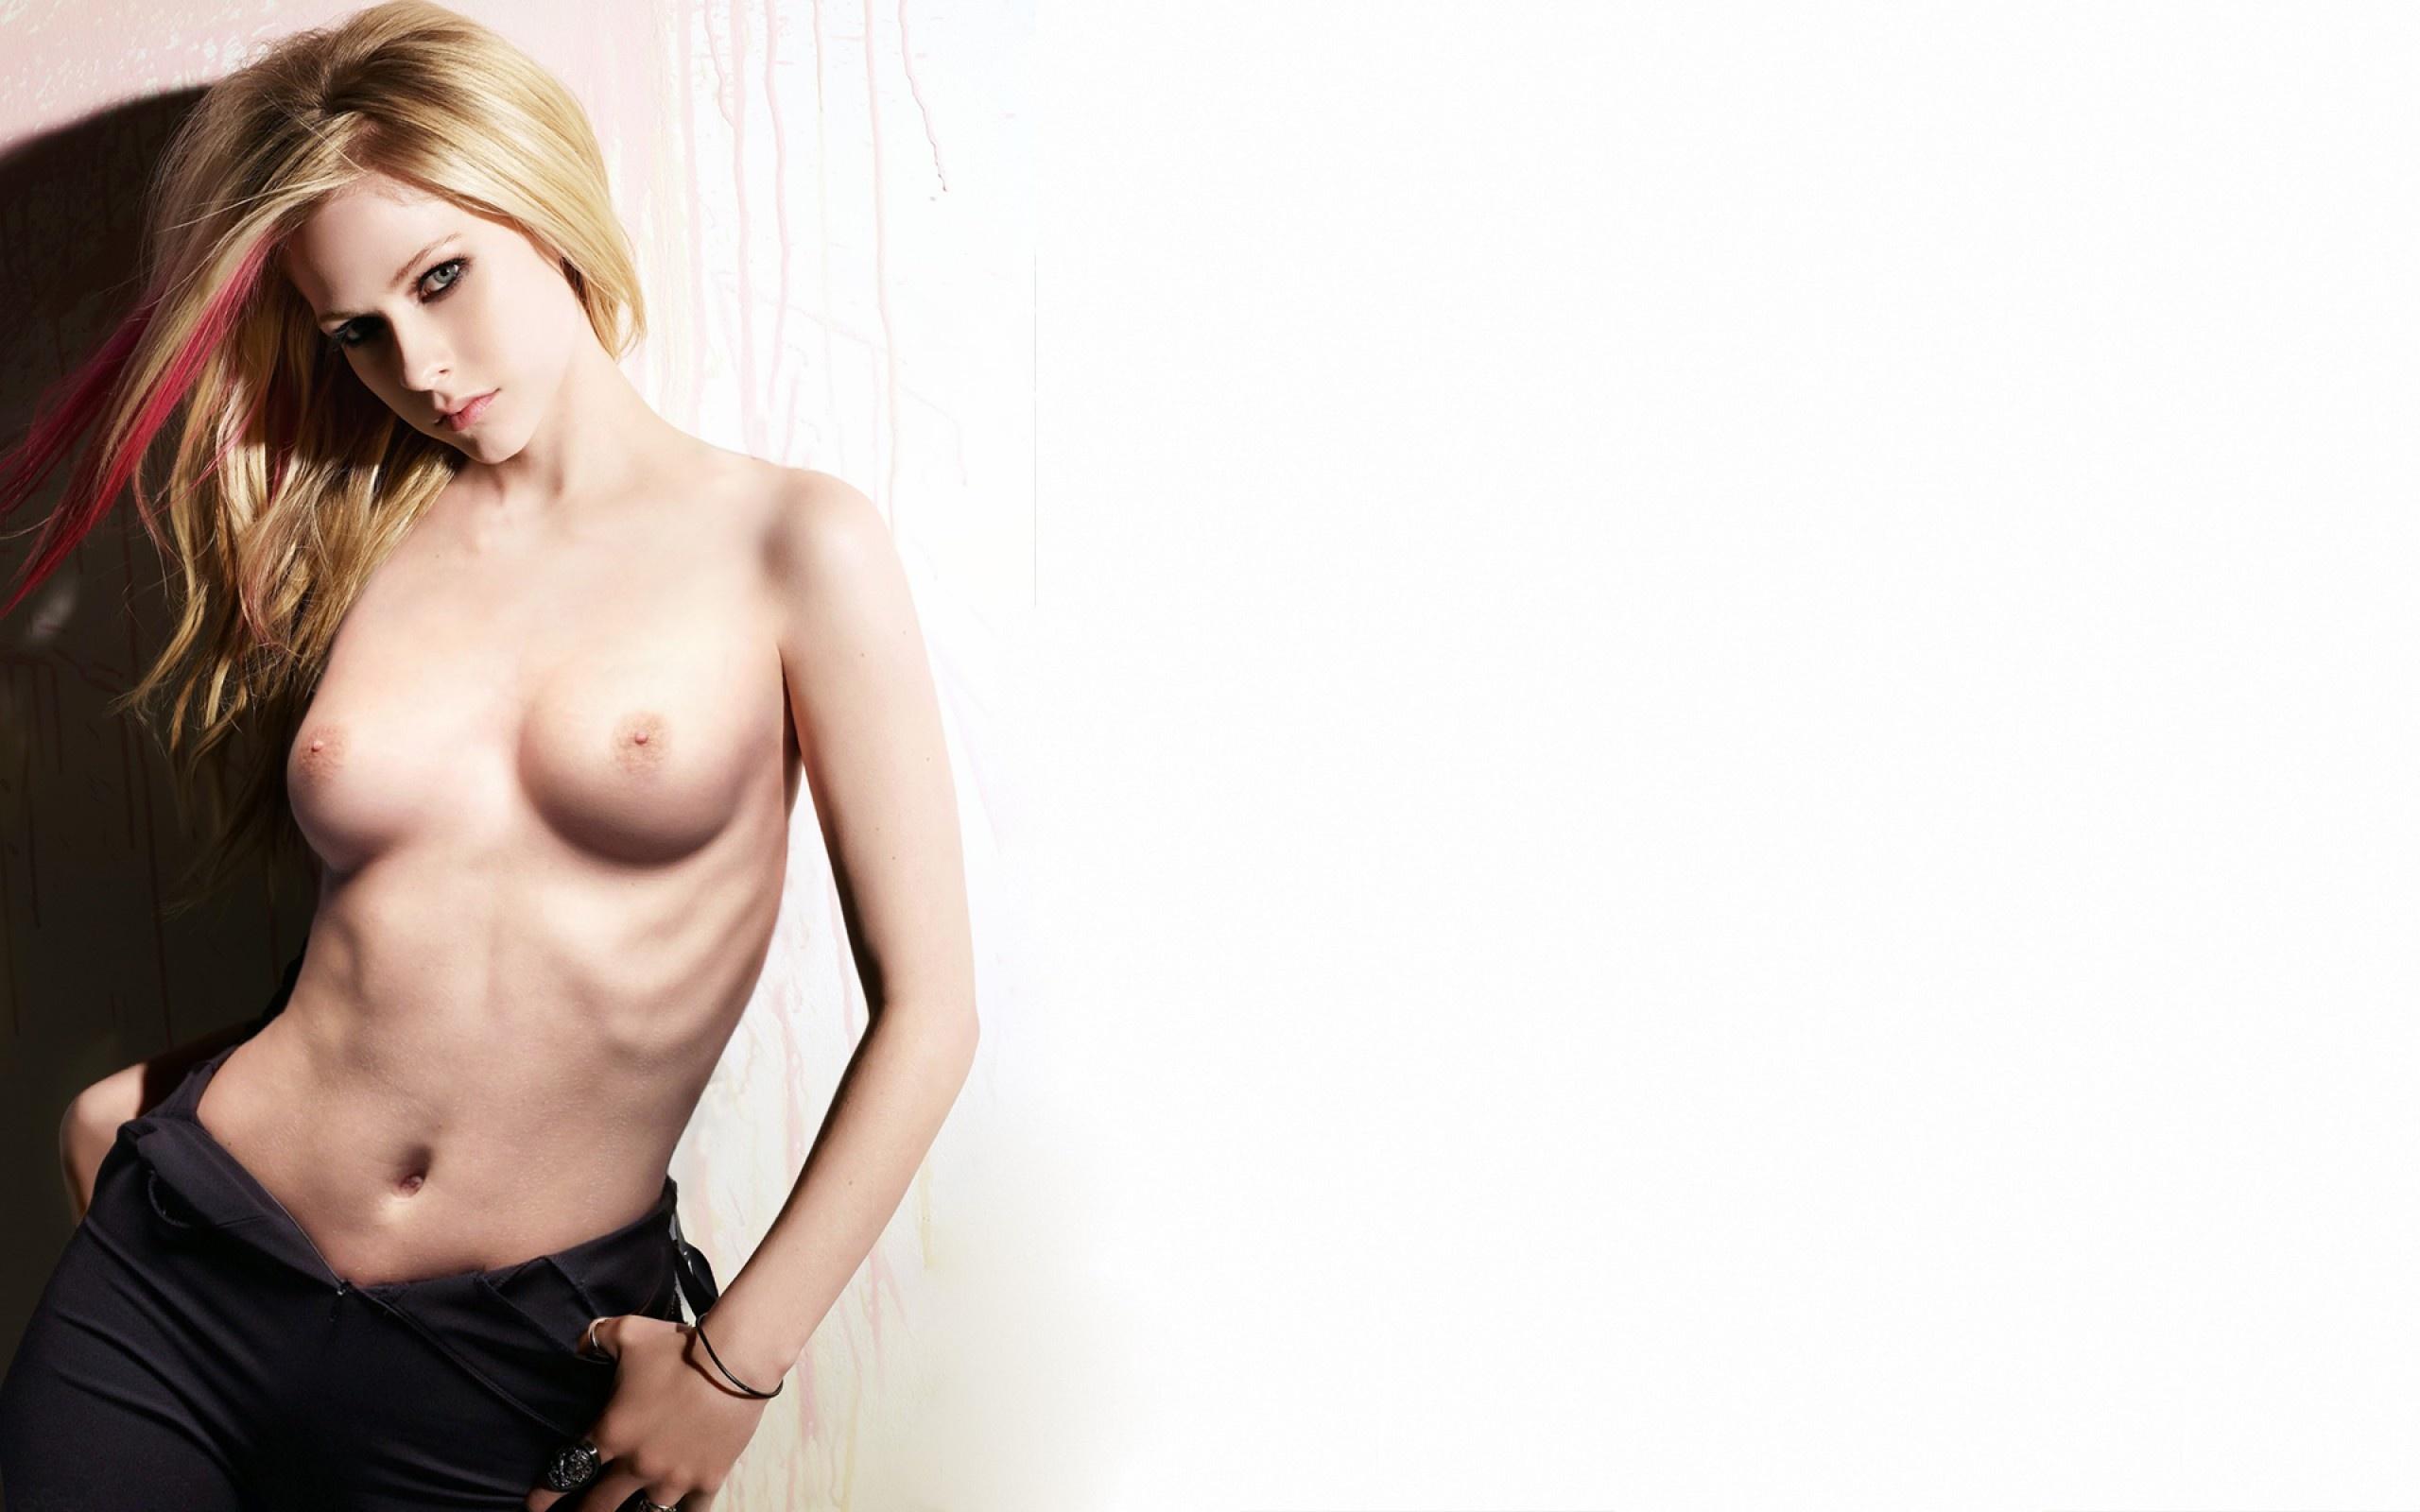 Avril Lavigne Boobs photo 14